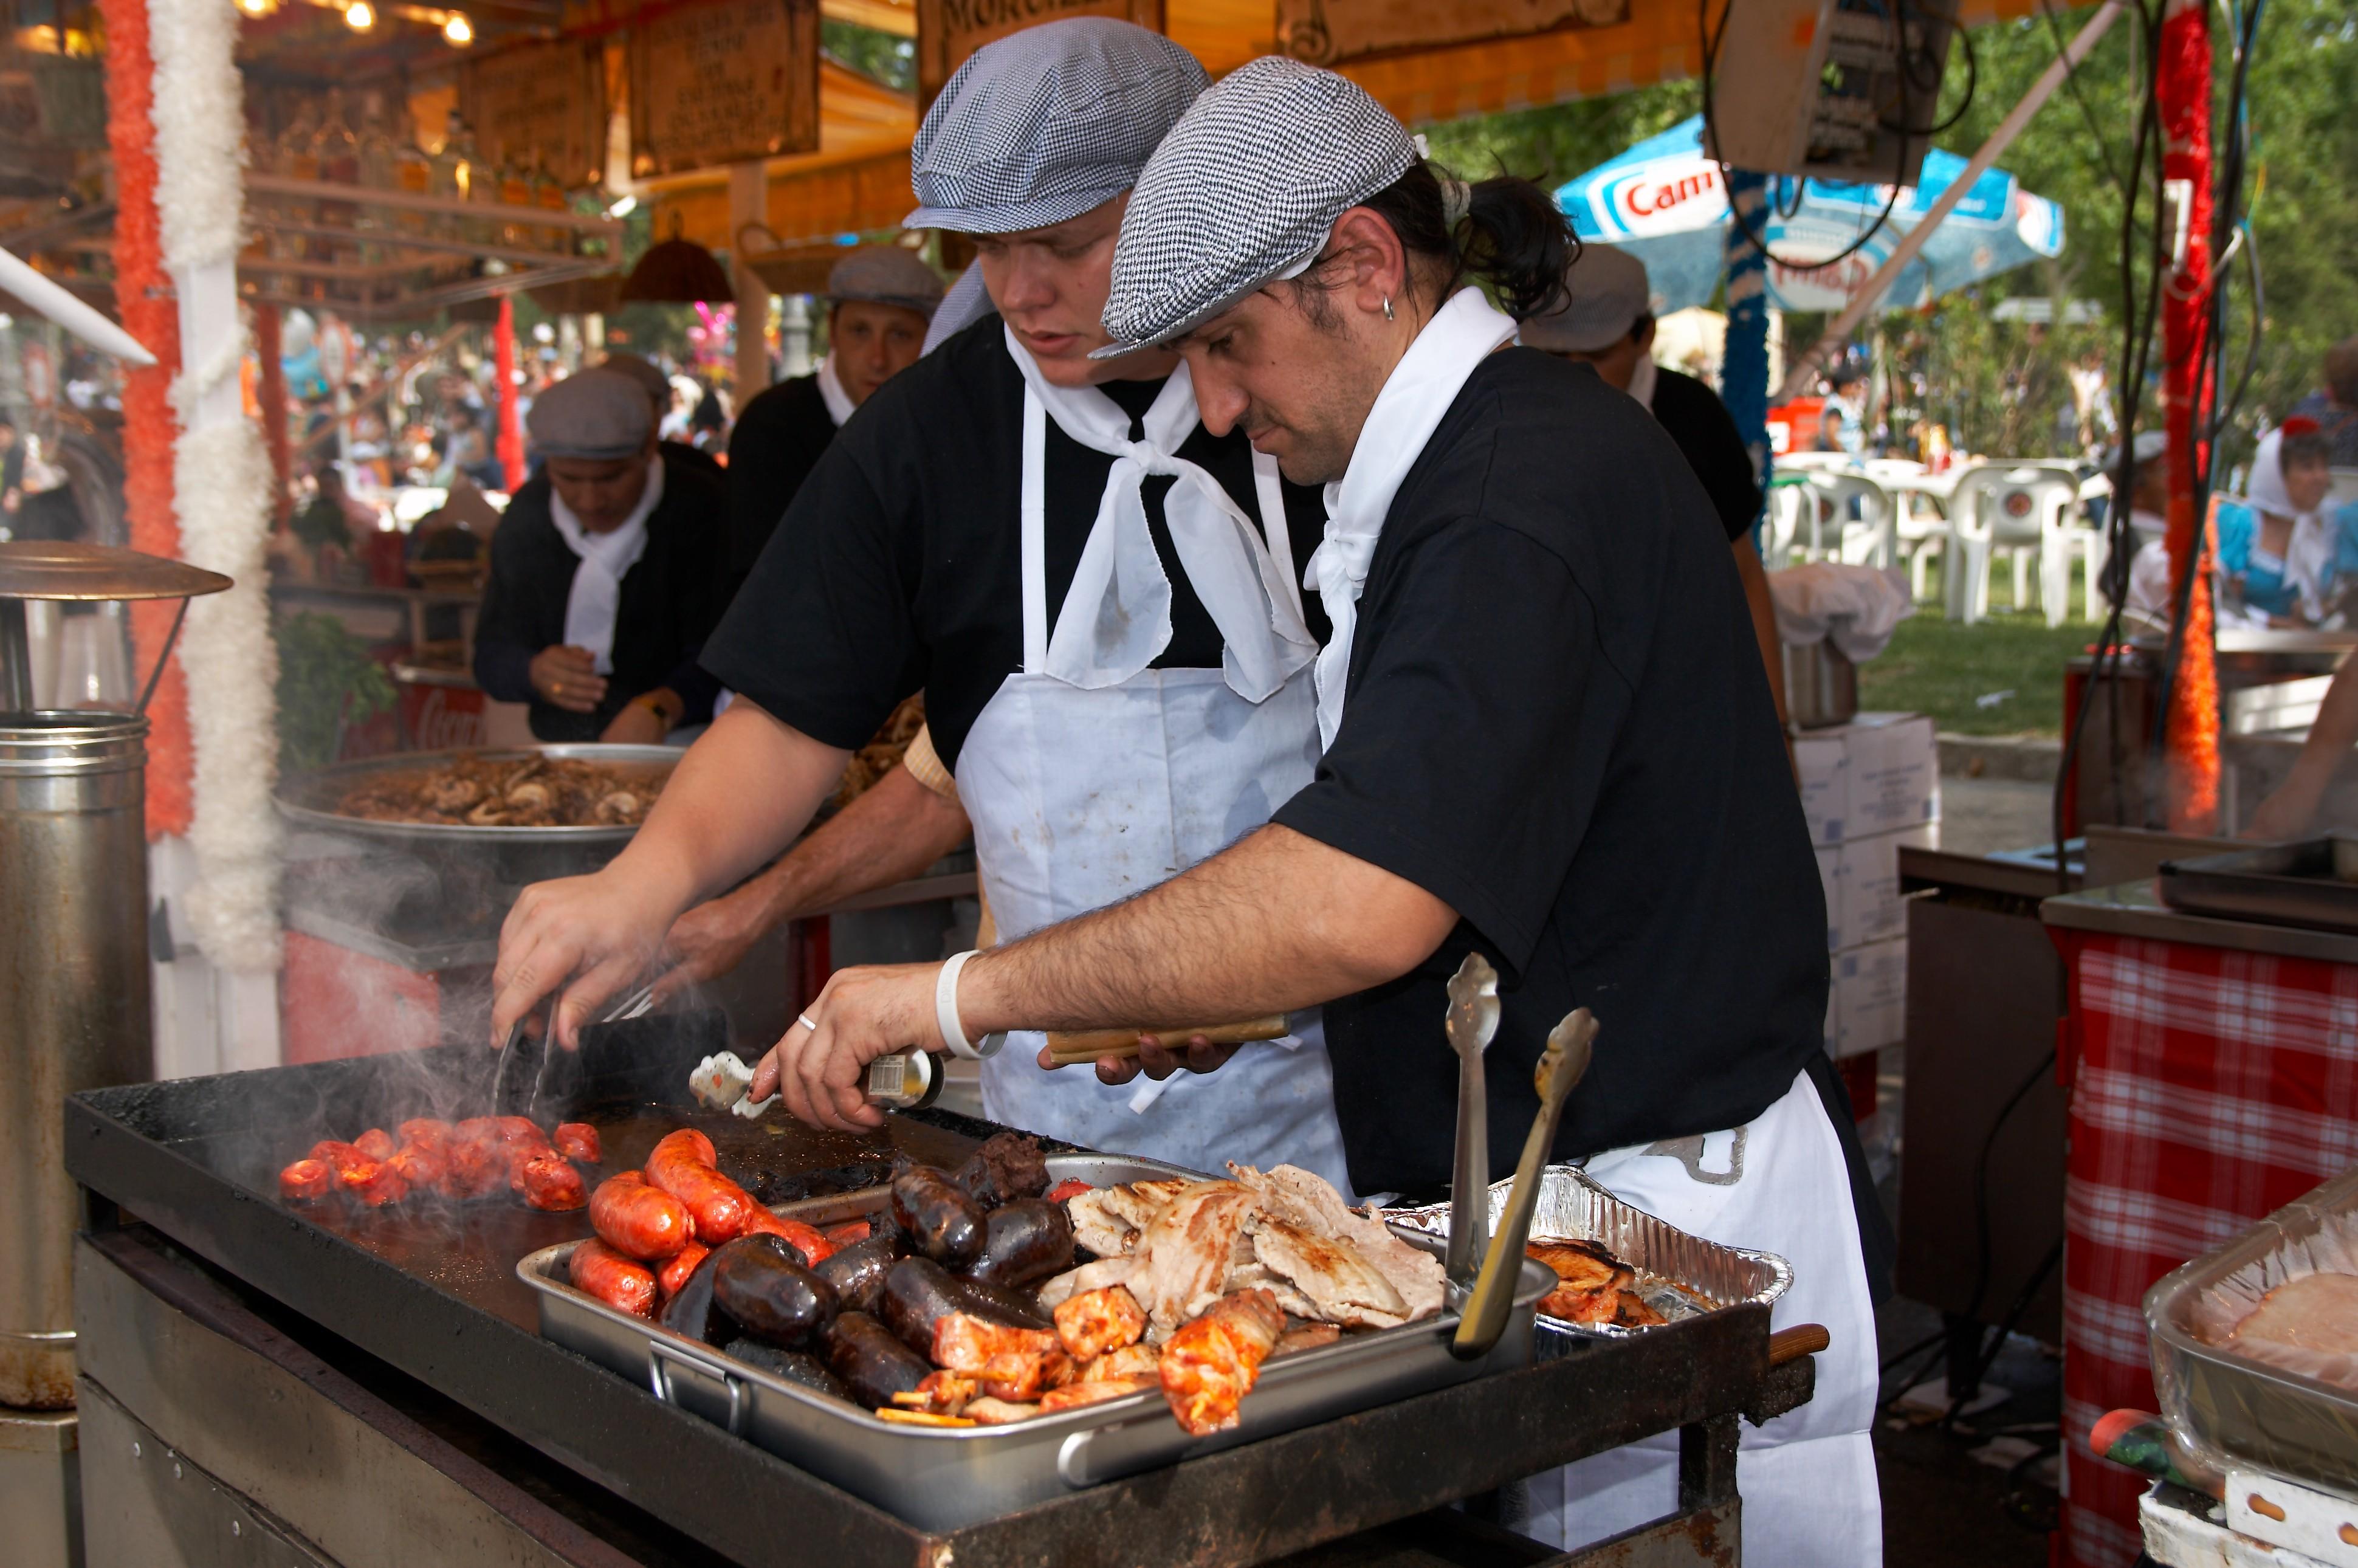 Madrid_-_Fiestas_de_San_Isidro_-_20070515-26 - Fiesta - Philippine Photo Gallery